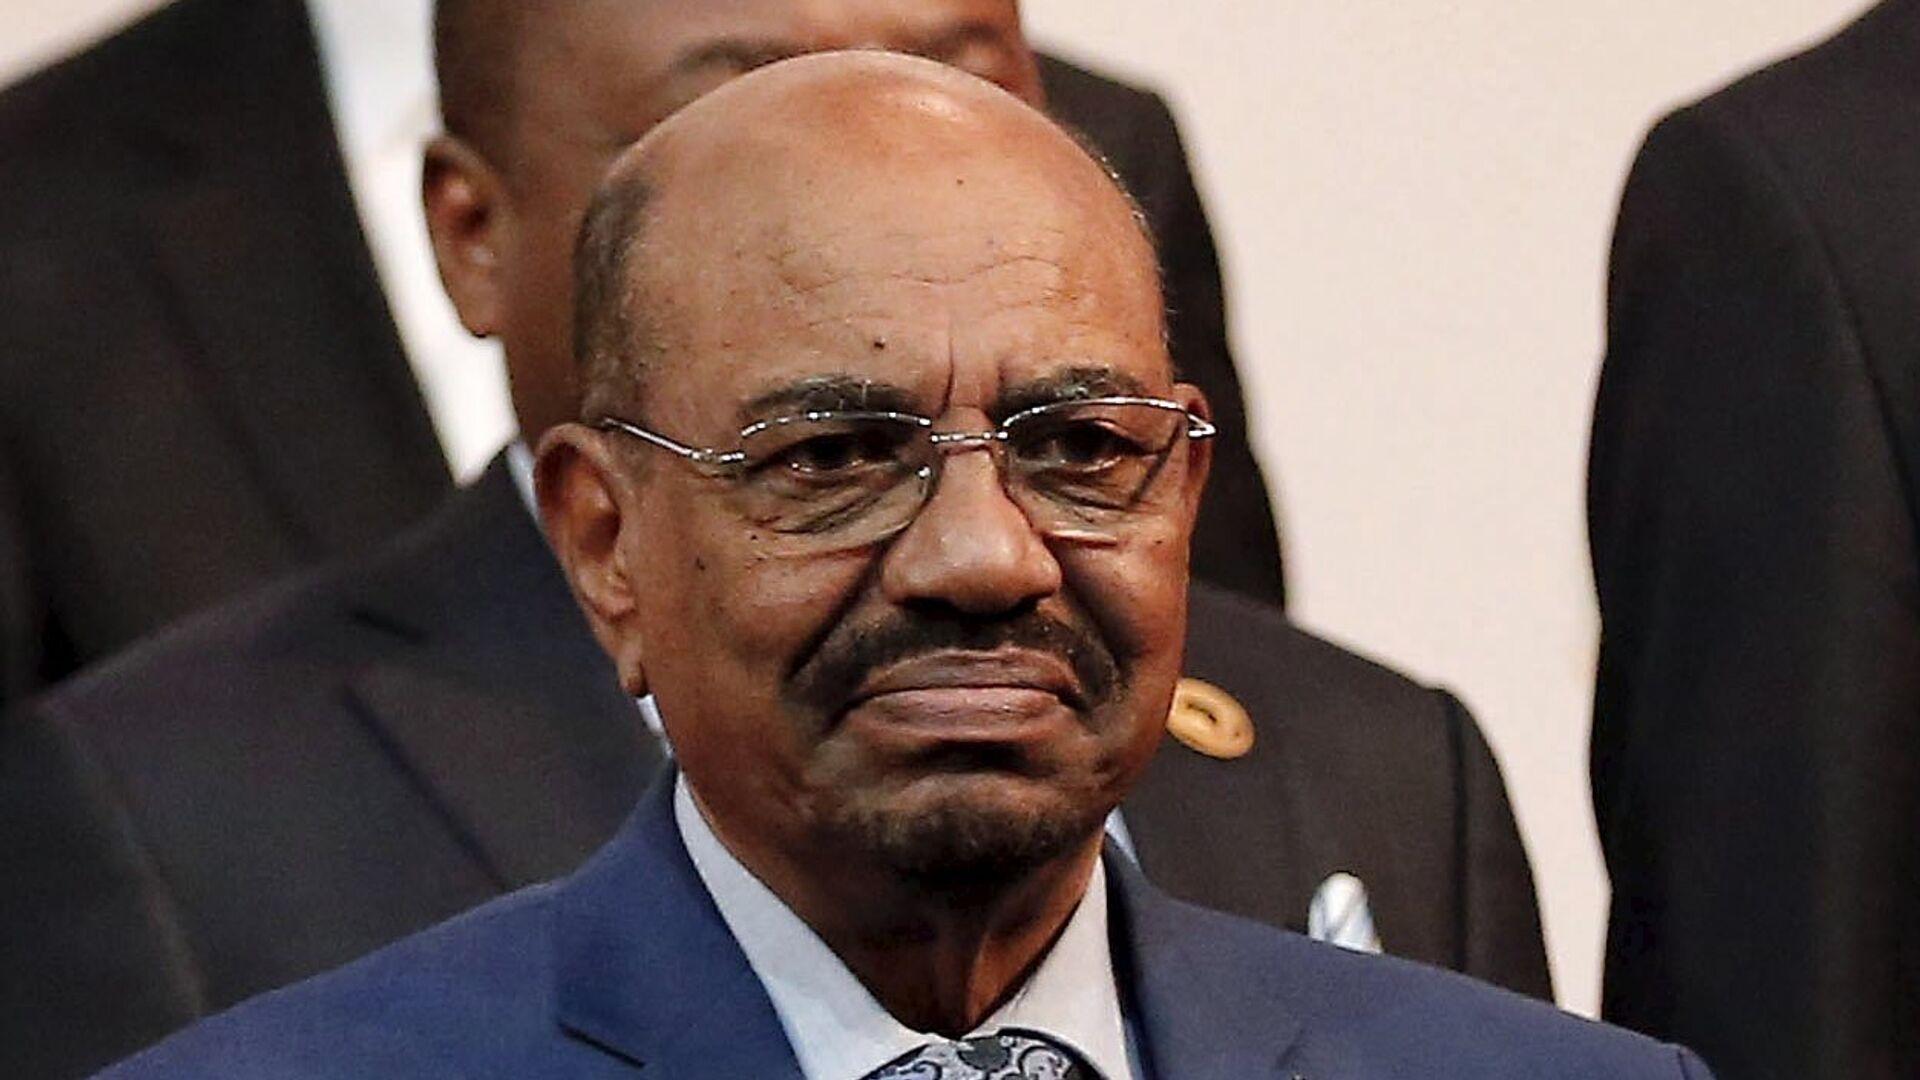 Sudan's President Omar al-Bashir prepares for a group photograph ahead of the African Union summit in Johannesburg June 14, 2015 - Sputnik Mundo, 1920, 30.06.2021